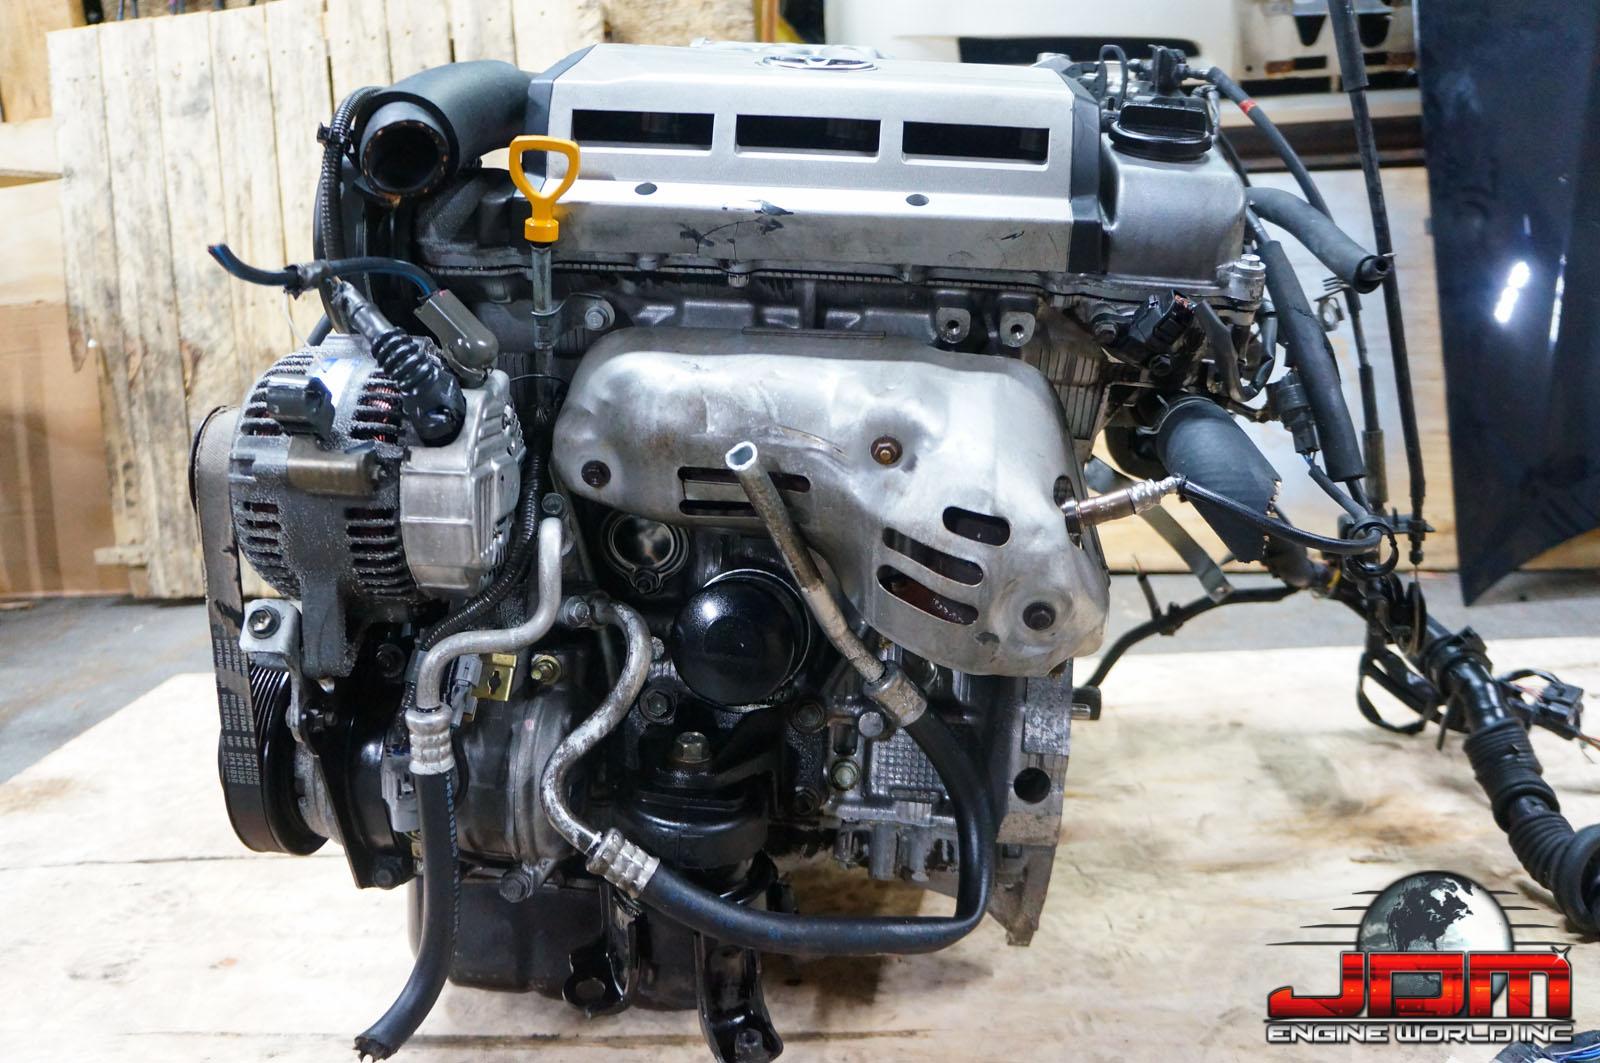 94 95 96 LEXUS ES300 1MZ-FE ENGINE 3.0L V6 NON-VVTi JDM 1MZ